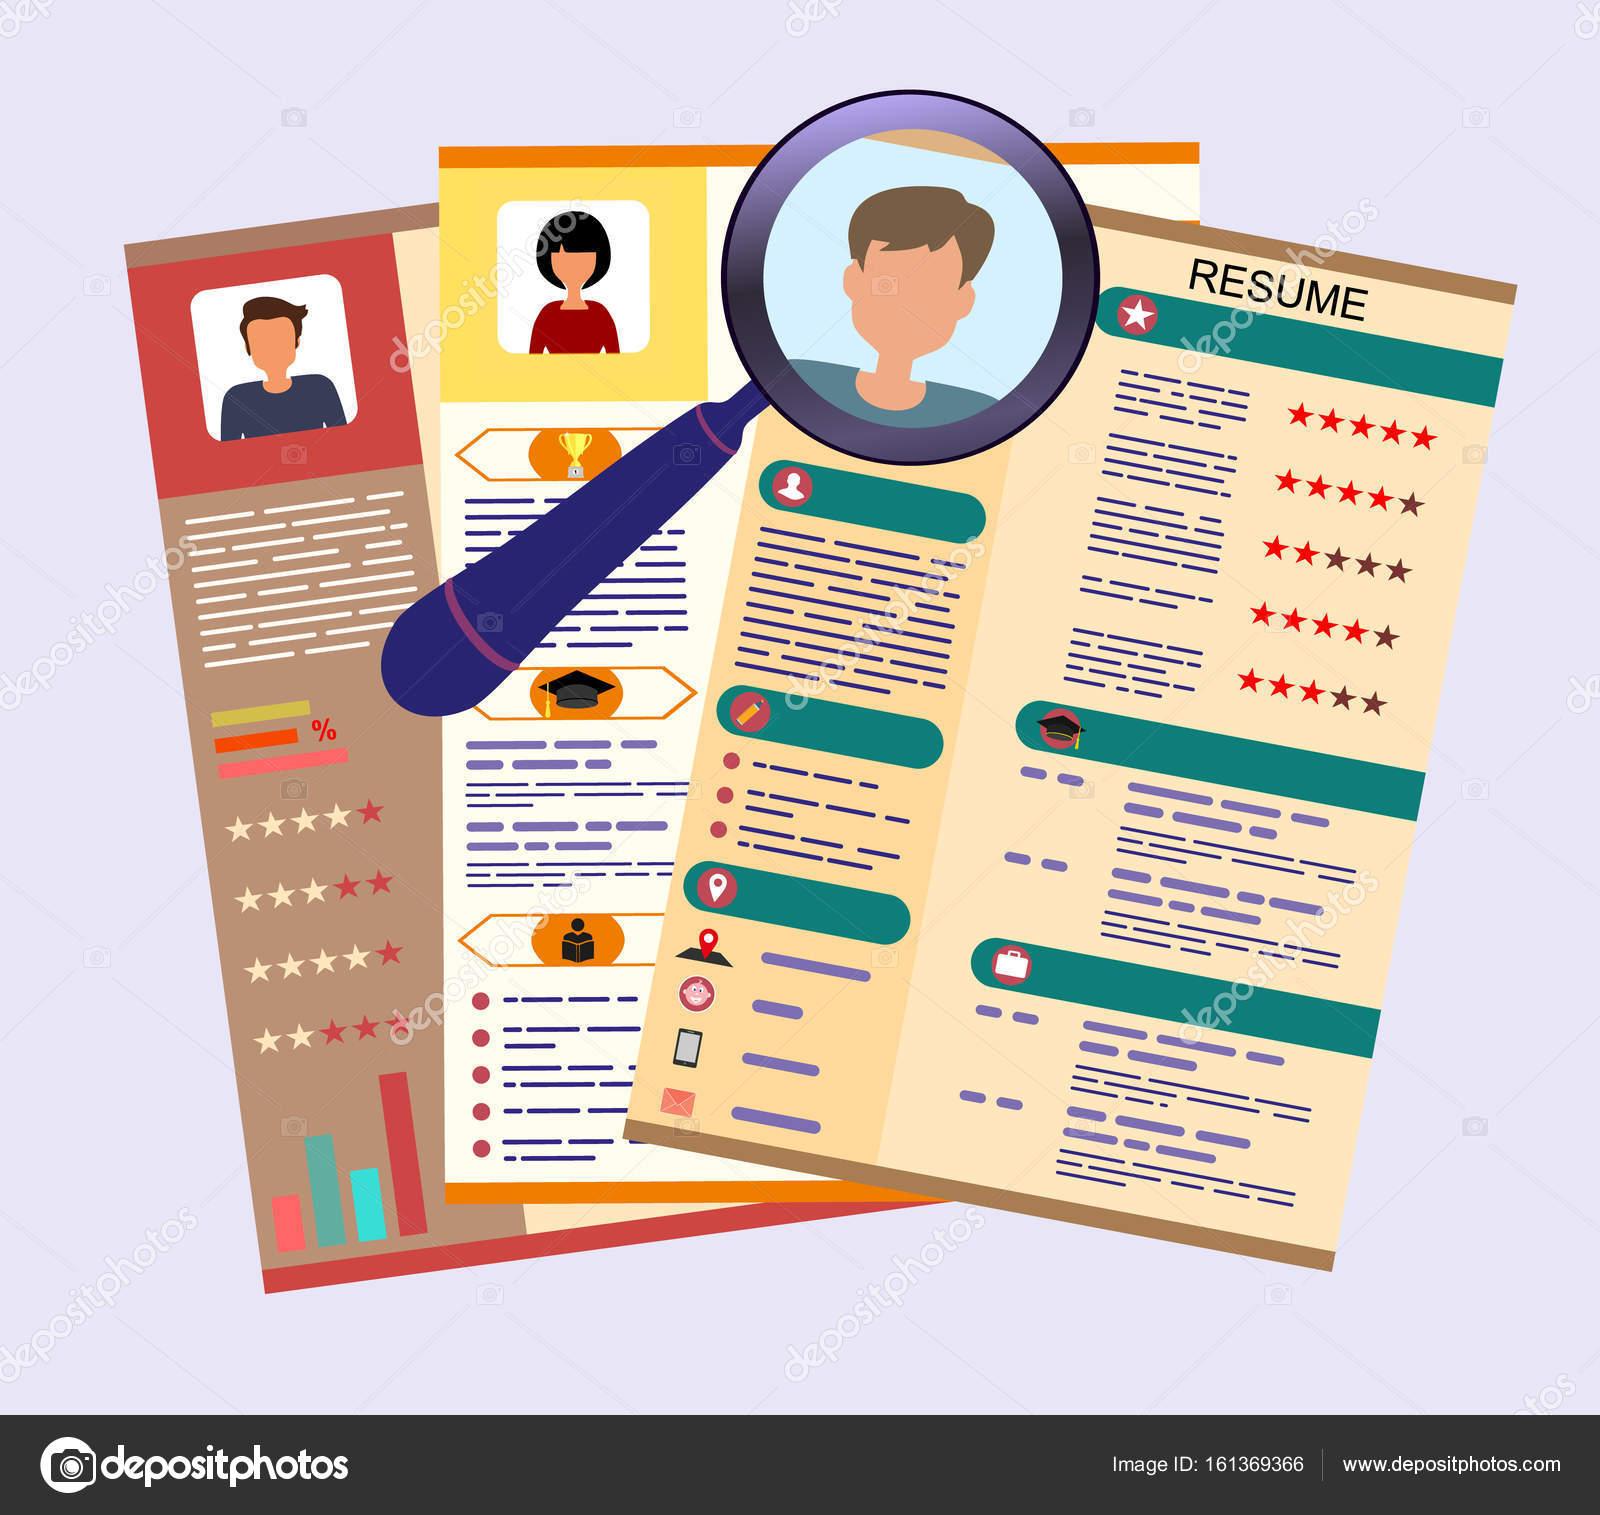 cv  resume template design with profile photo cv icon   u2014 stock vector  u00a9 dve